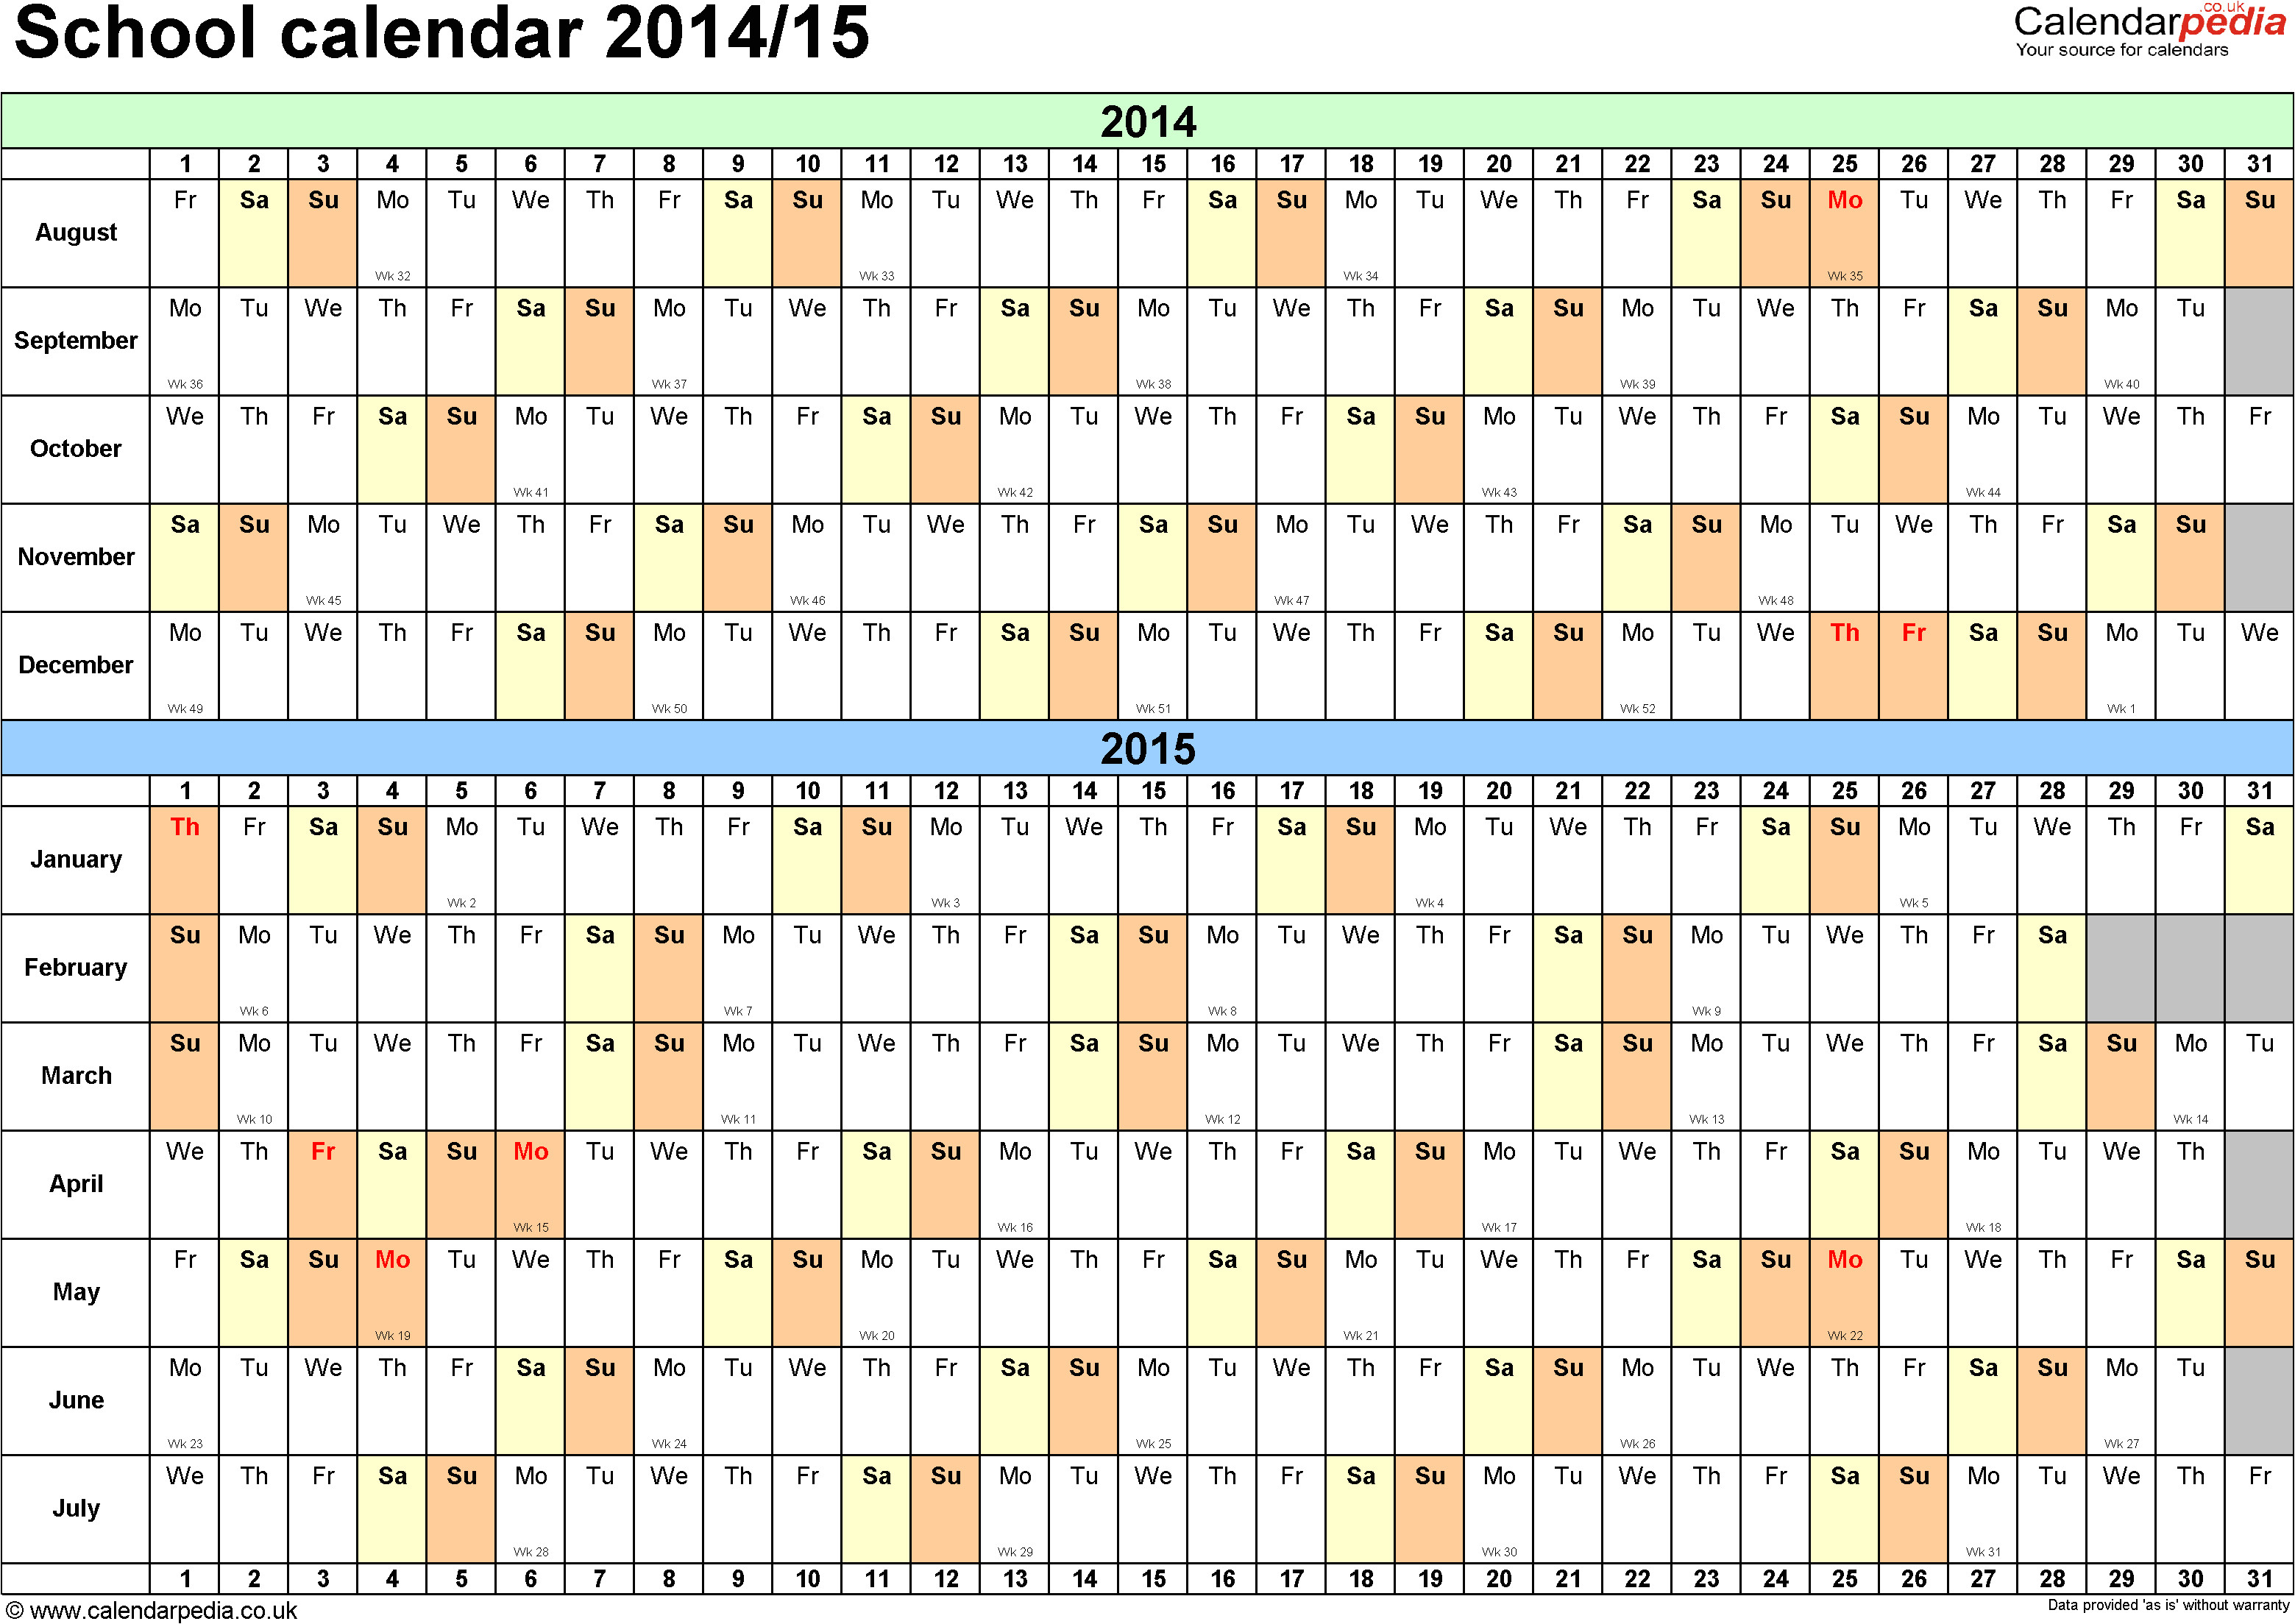 school calendar 2014 2015 word templates